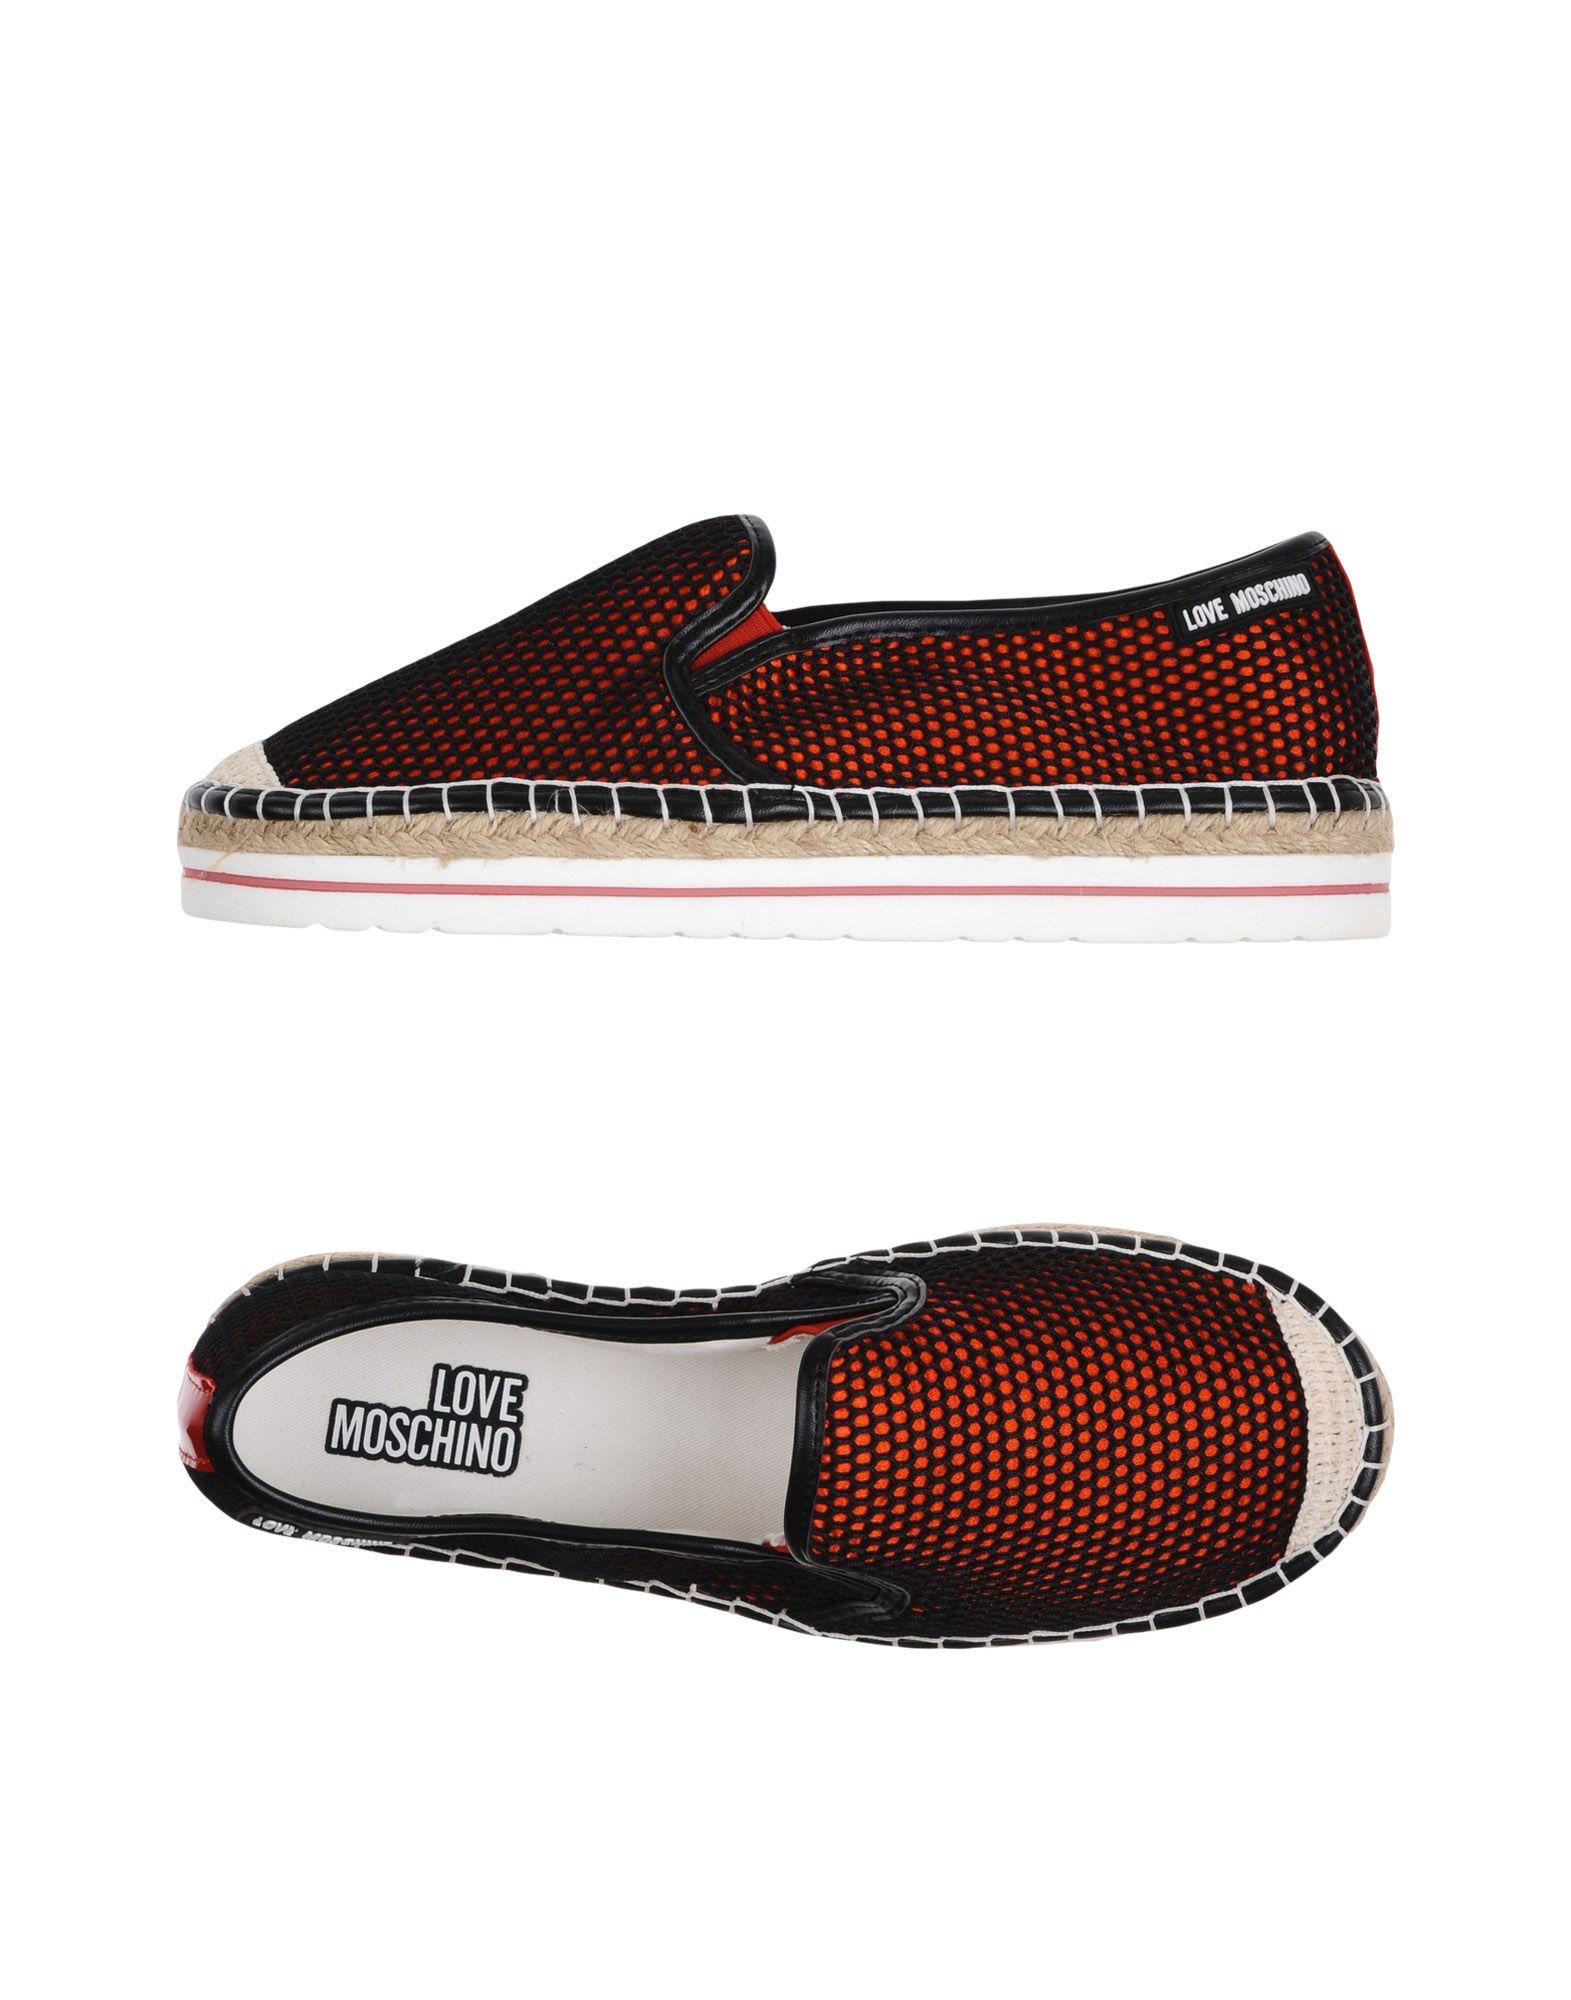 Love Moschino Espadrilles Damen  11284386DT Gute Qualität beliebte Schuhe